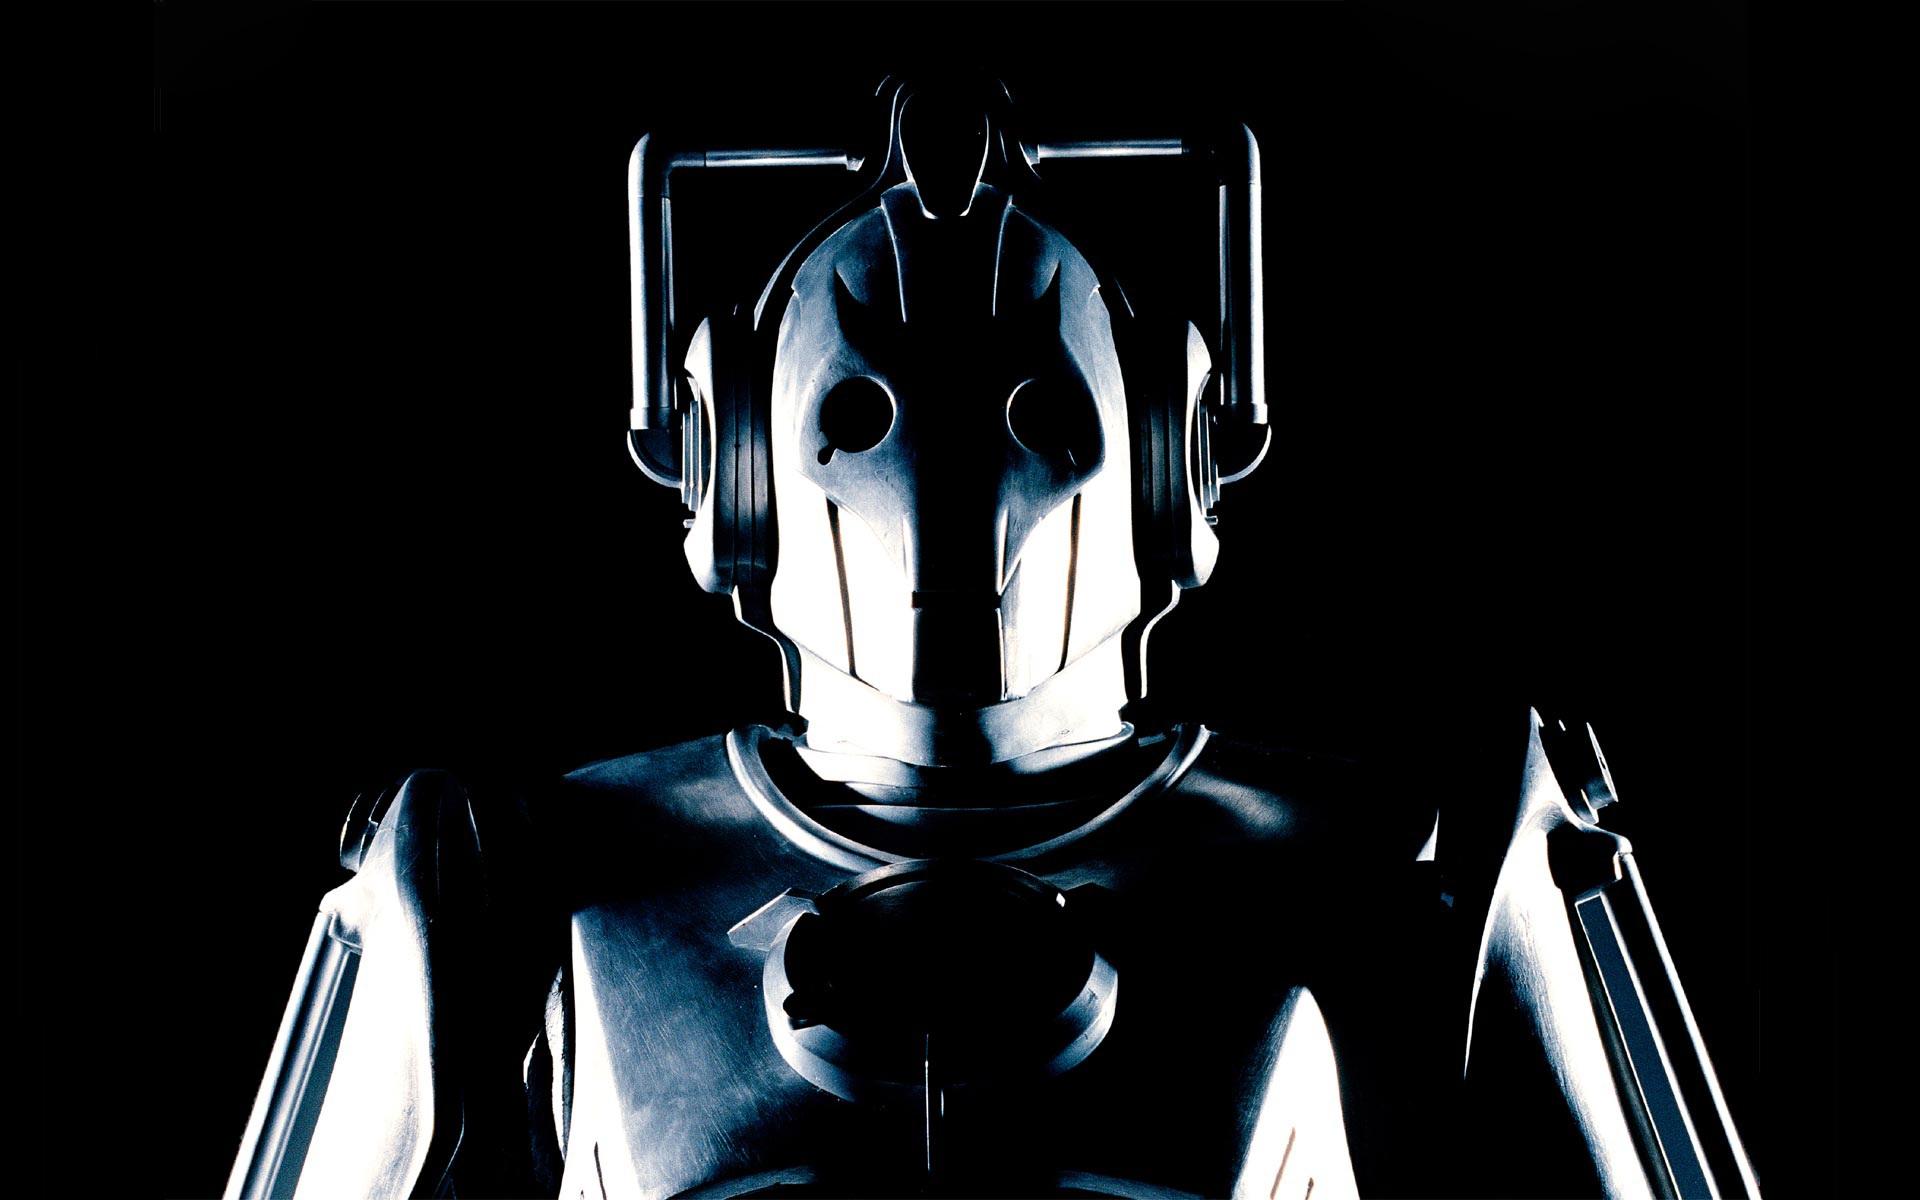 Televisieprogramma - Doctor Who  Doctor Who Cybermen Wallpaper